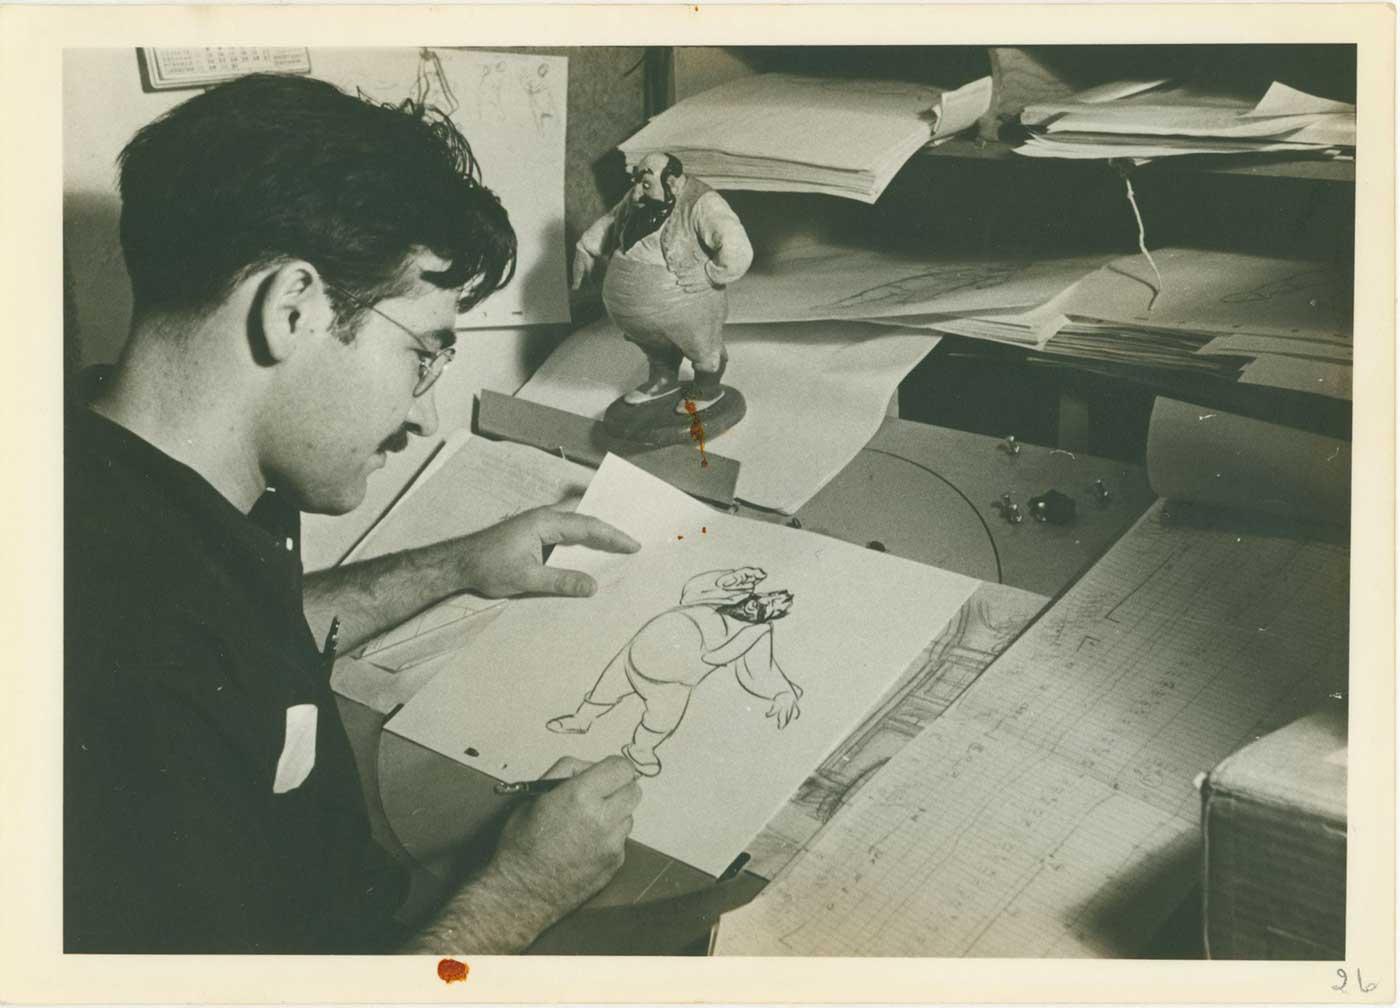 Photograph of Vladimir Tytla; collection of the Walt Disney Family Foundation, © Disney